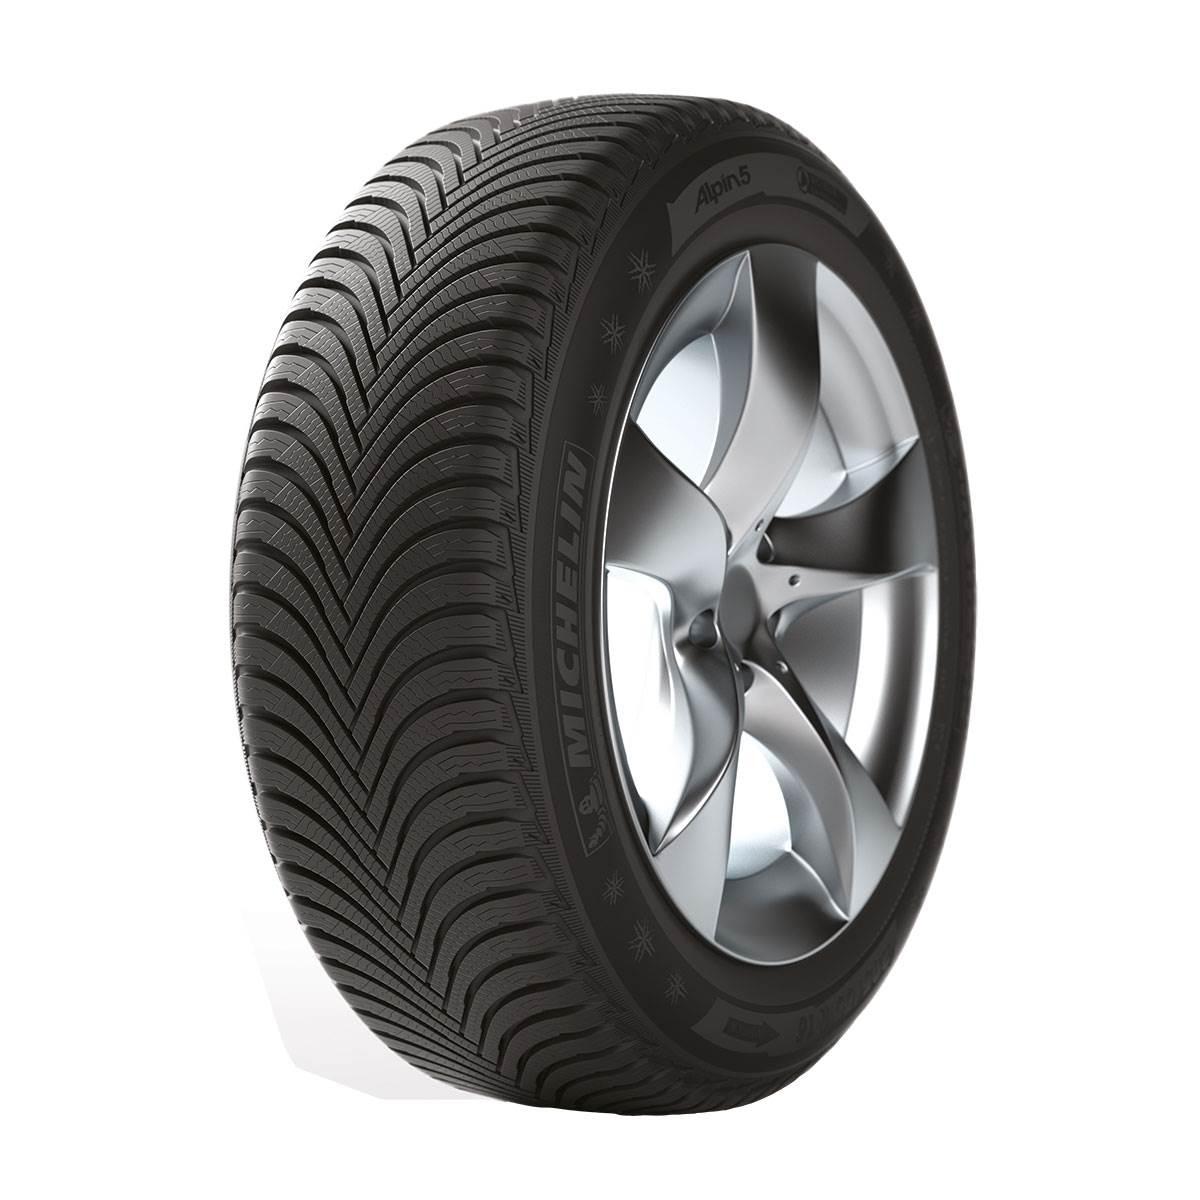 Pneu Hiver Michelin 225/45R17 94V Alpin A5 XL